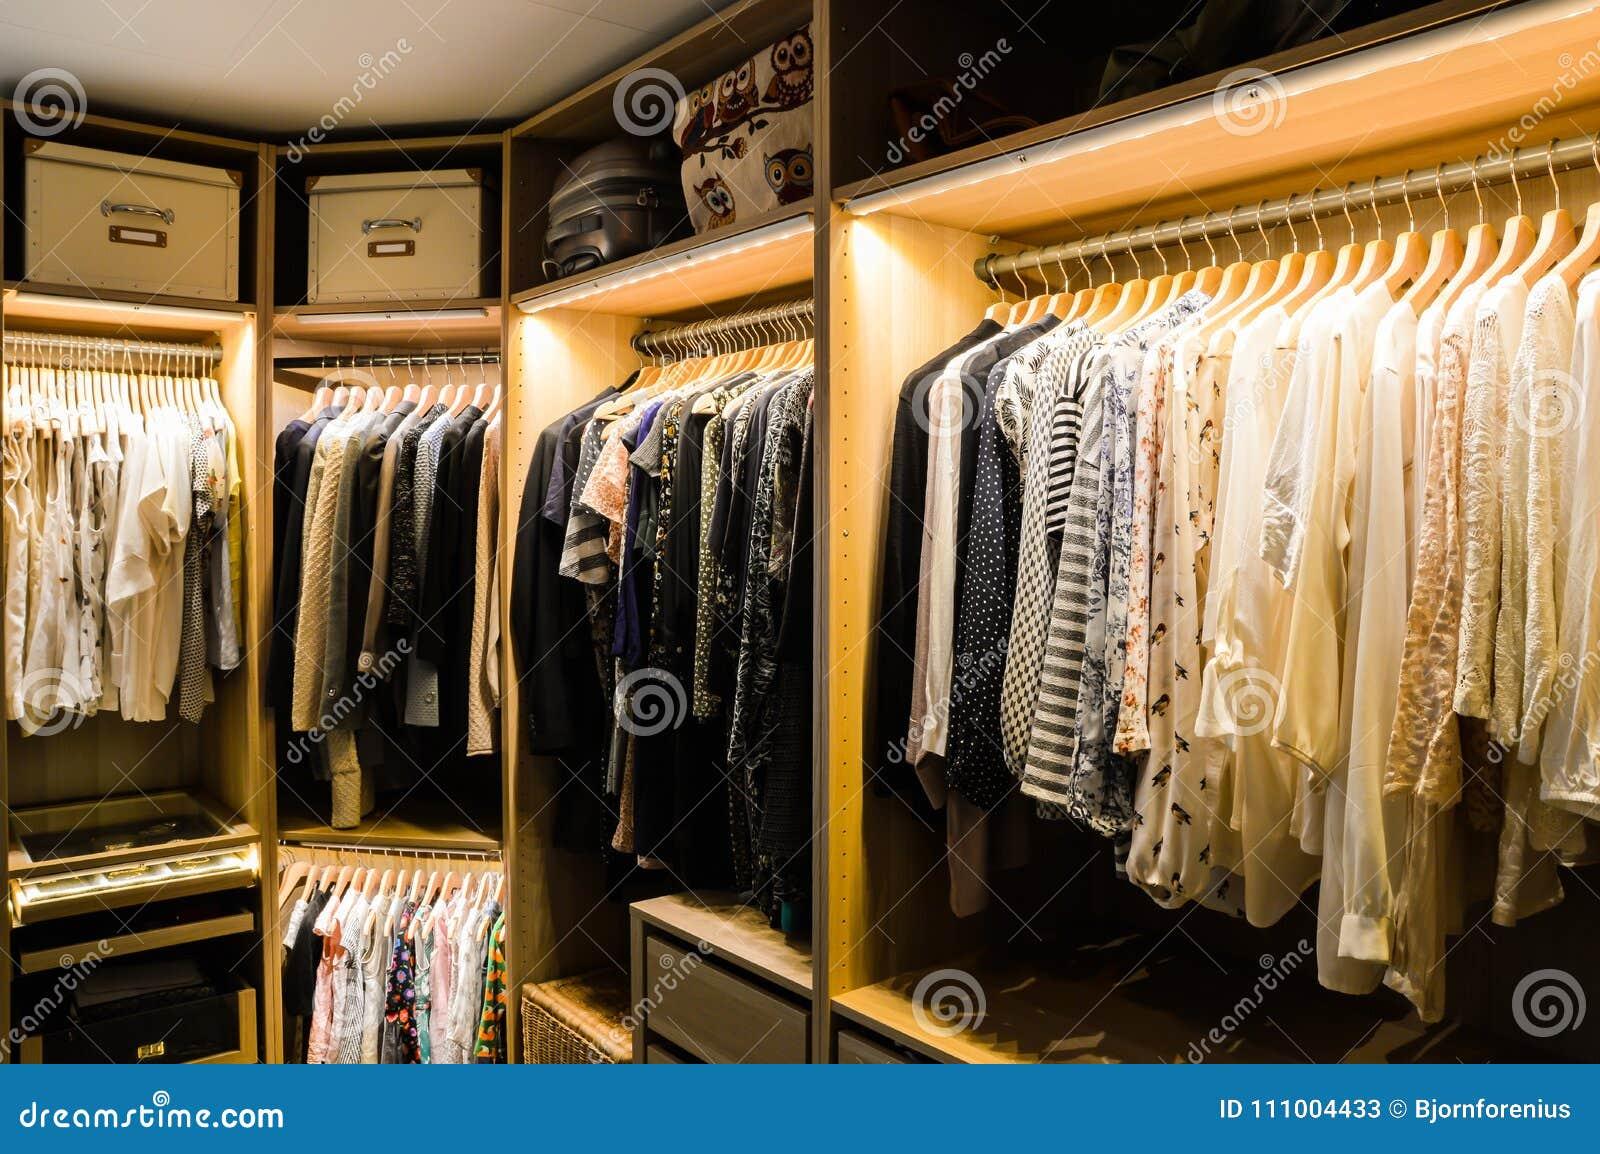 Walk in closet, dressing room